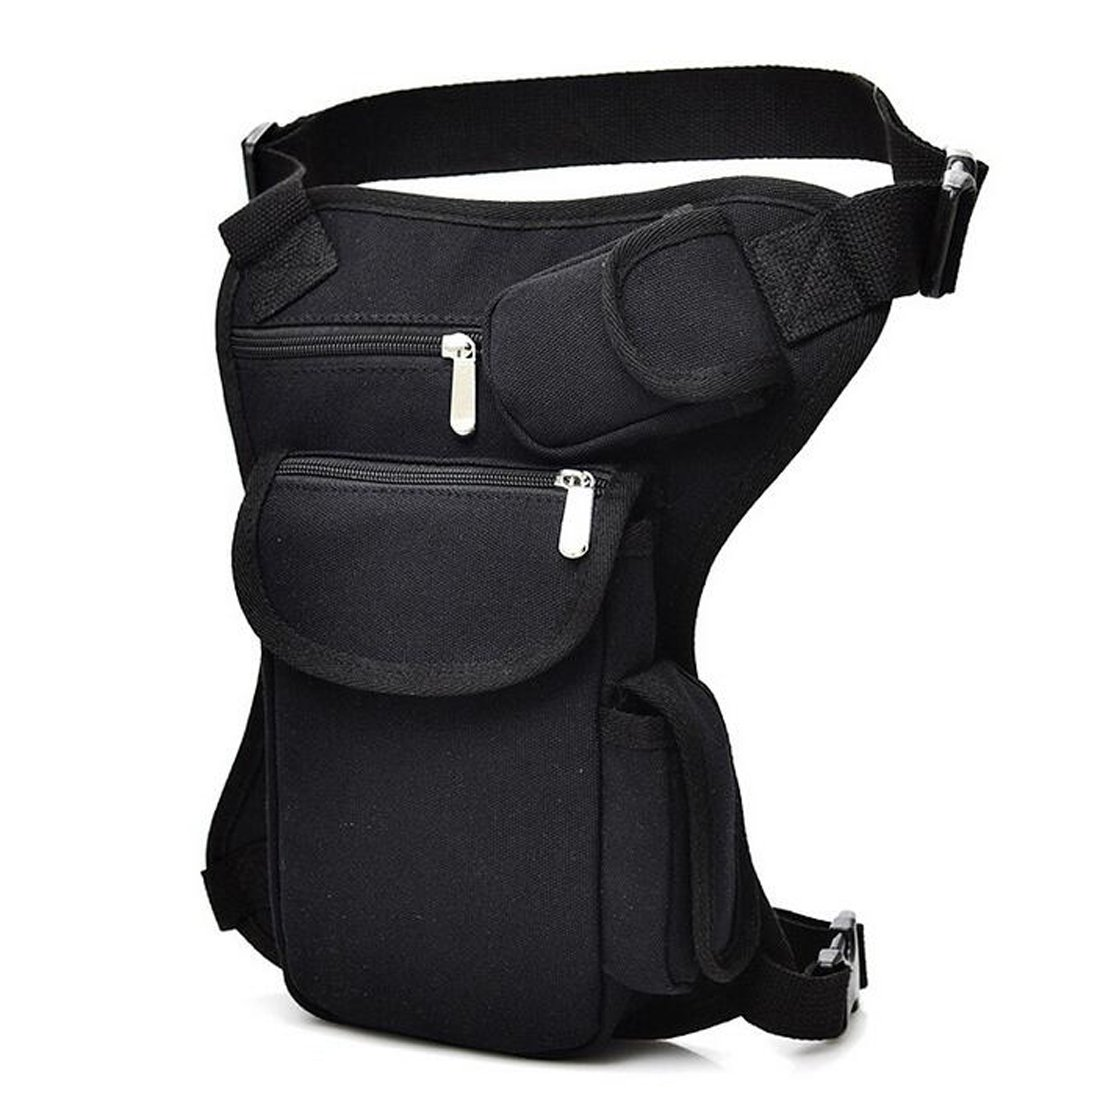 SEALINF Canvas Waist Bag Fanny Pack Racing Drop Leg Bag Motorcycle Outdoor Bag (black)